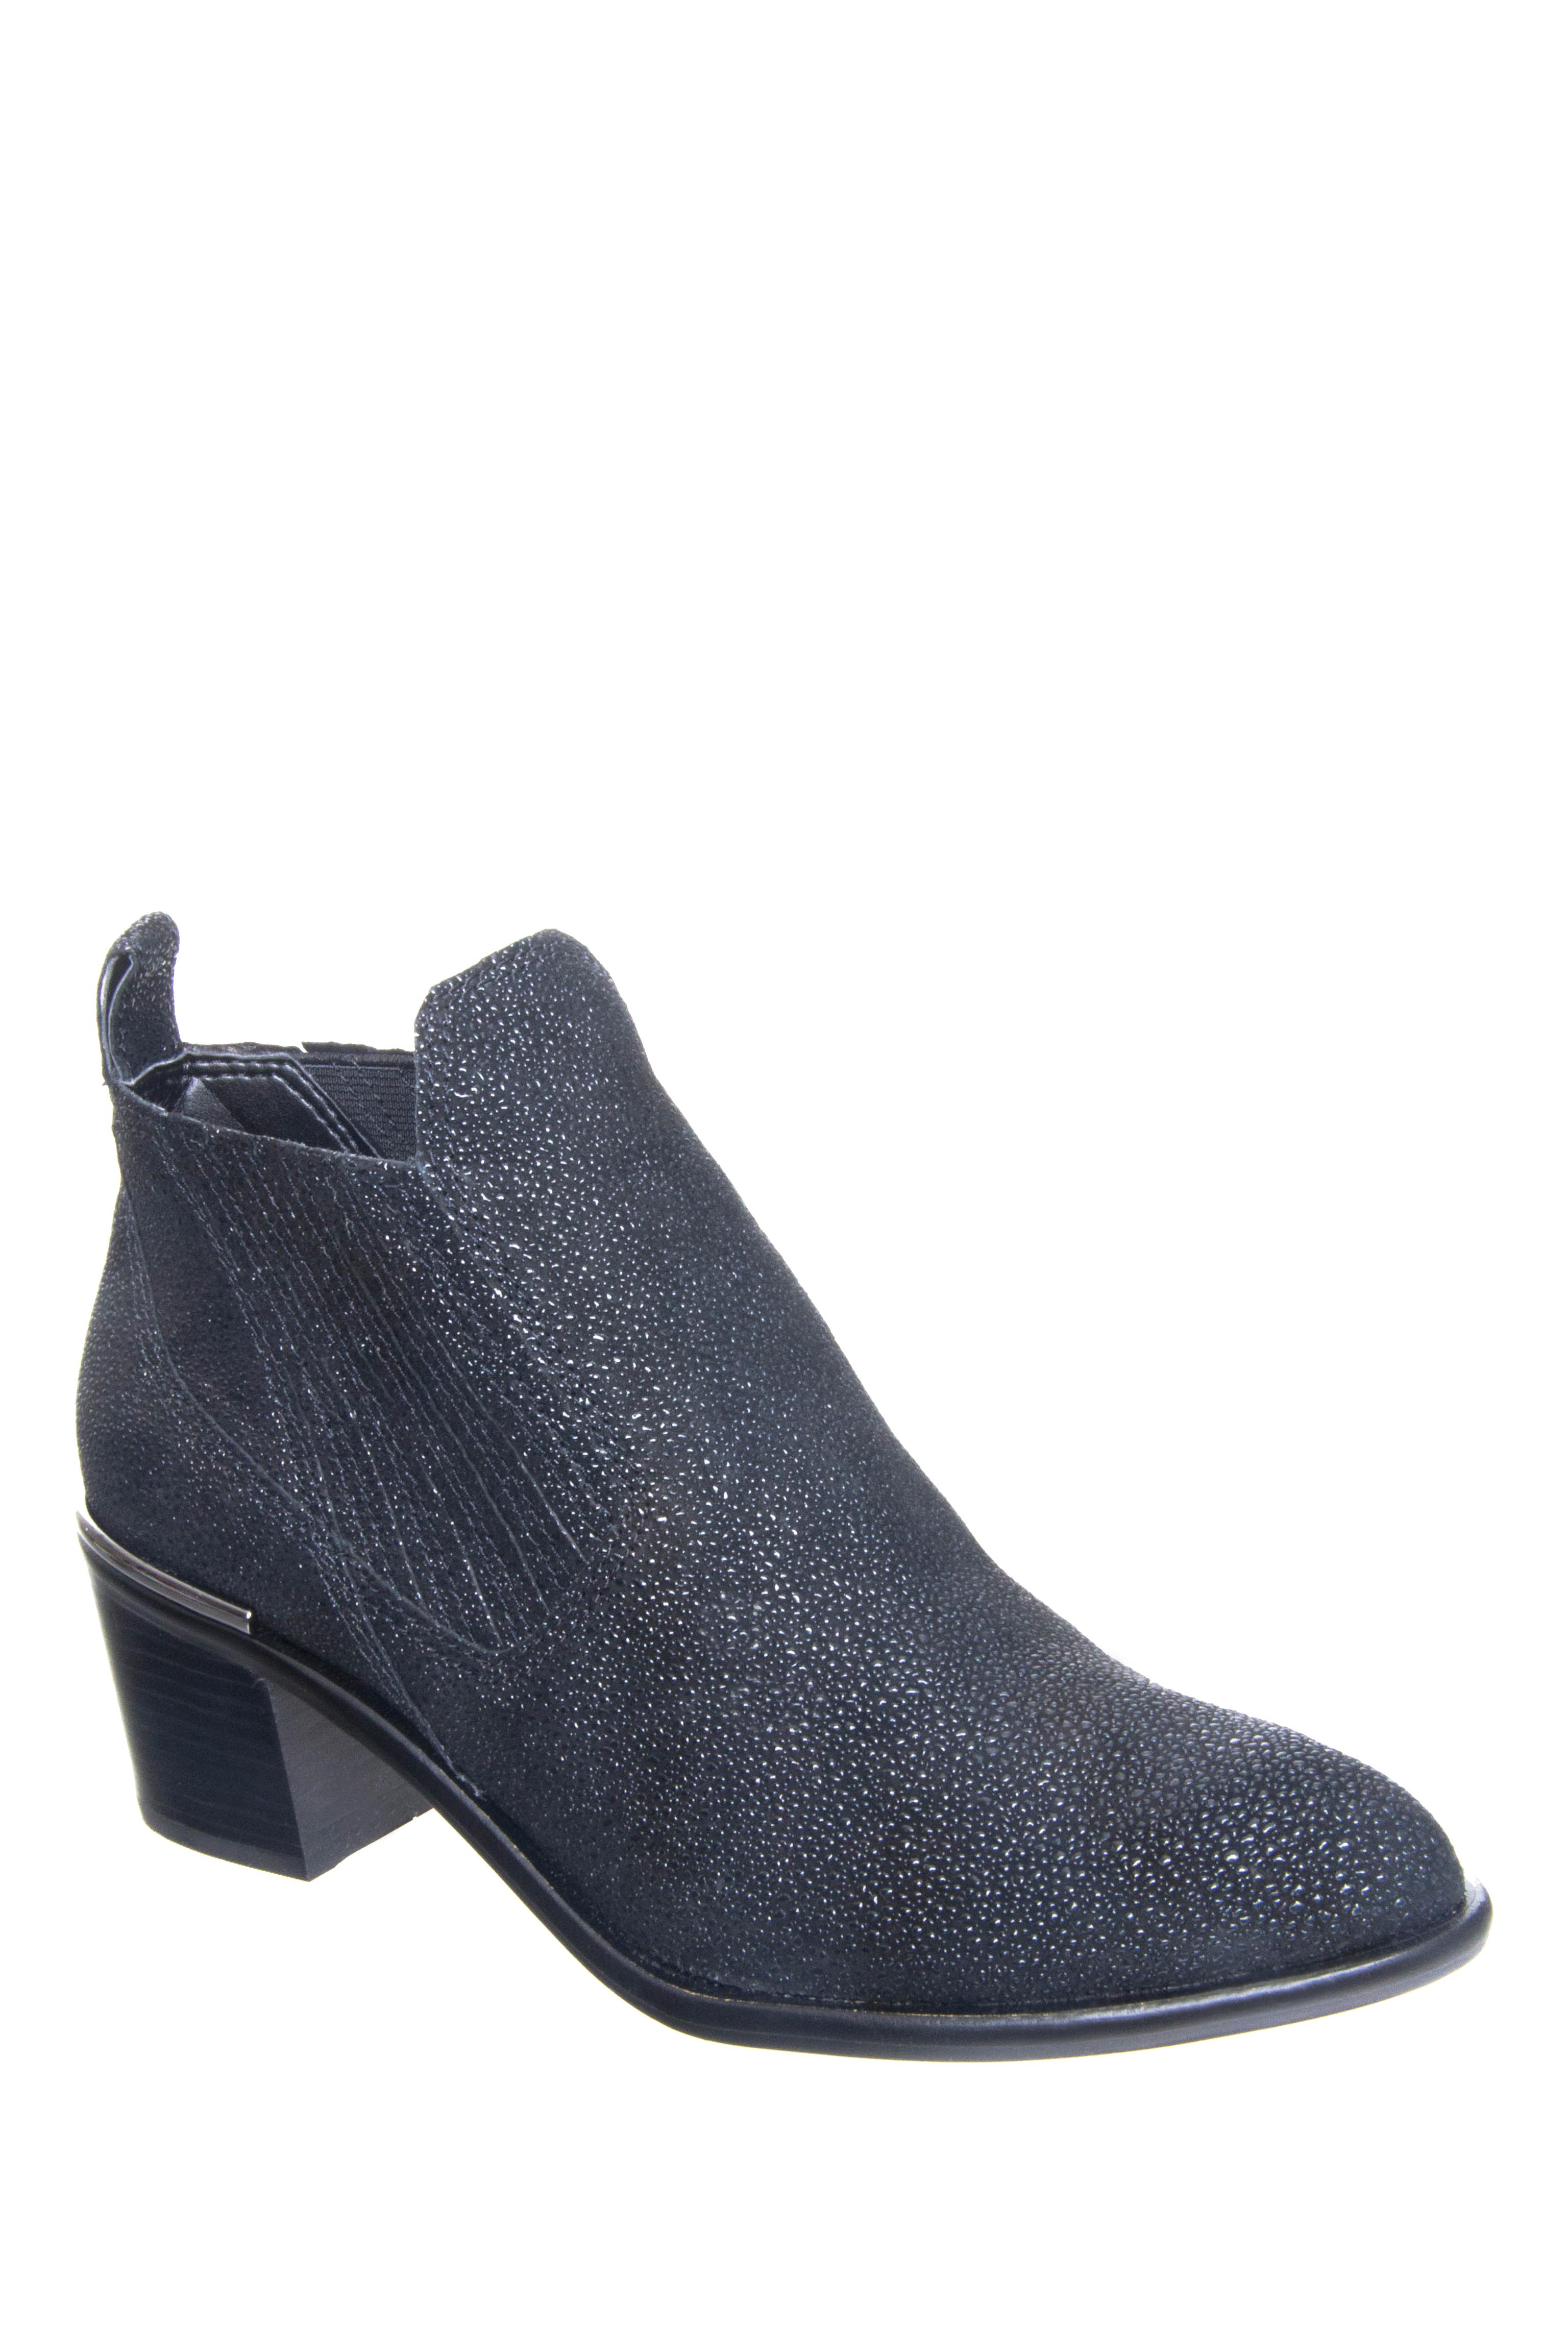 Dolce Vita Percy Mid Heel Booties - Black